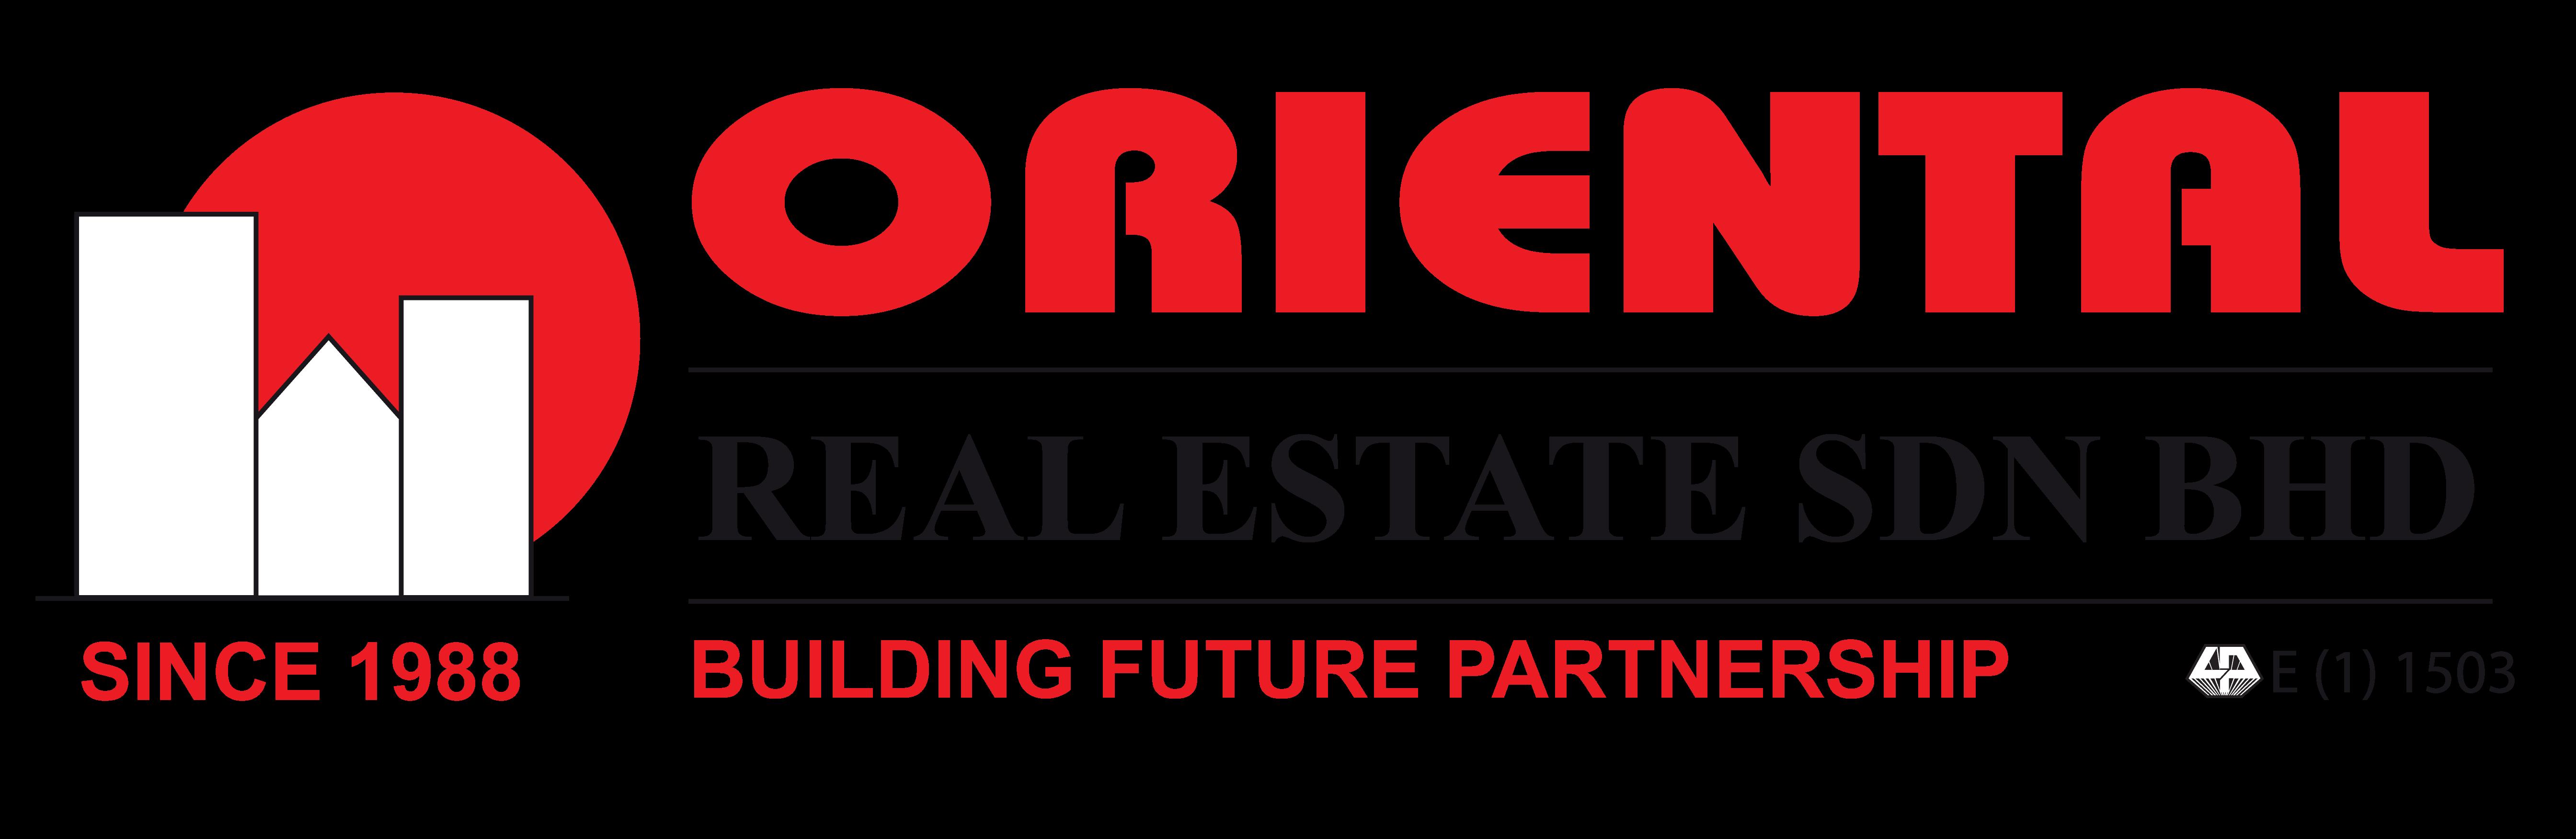 Oriental Real Estate Sdn Bhd